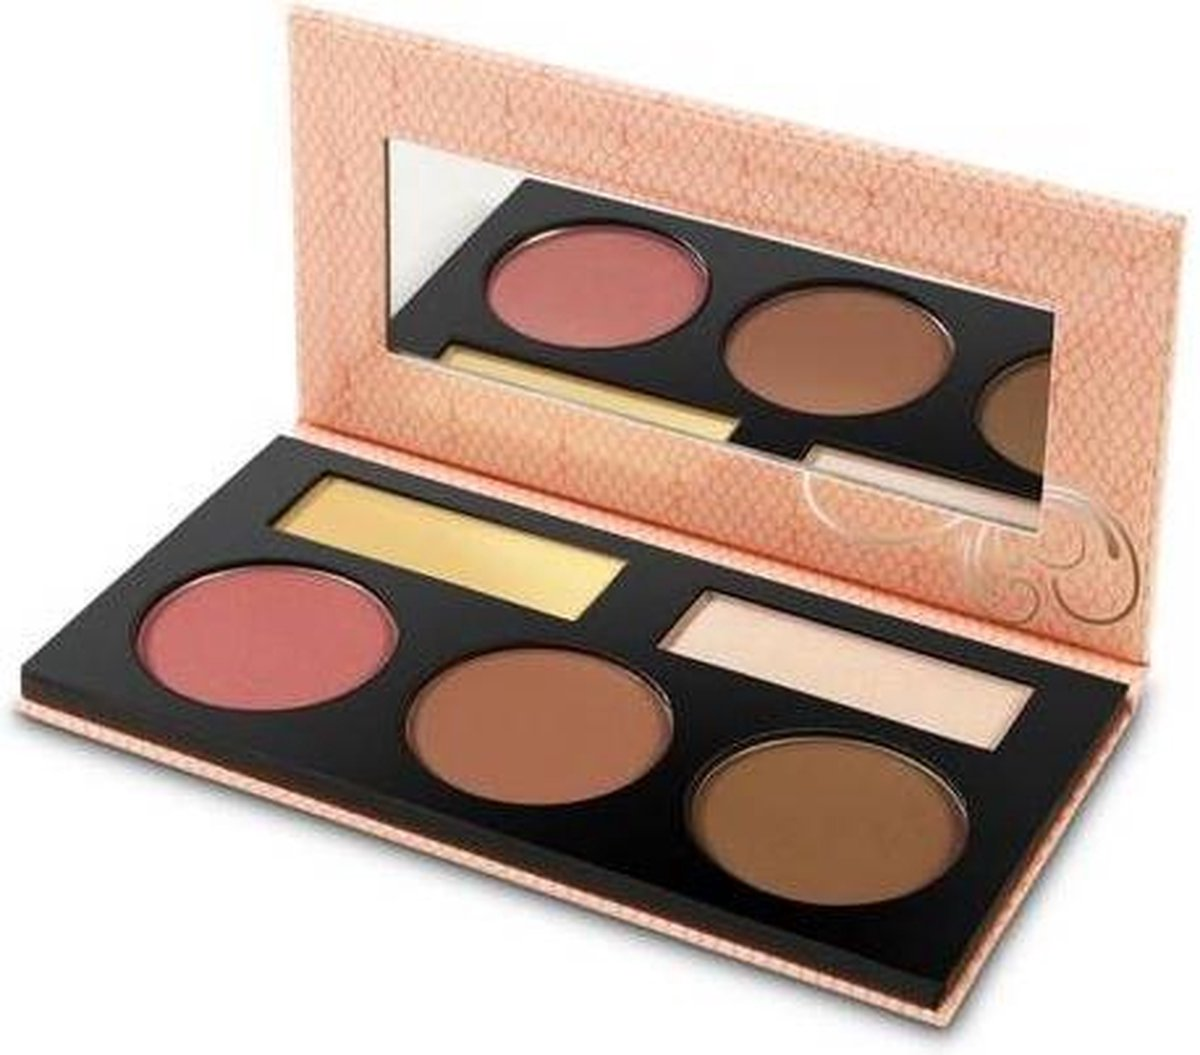 BH Cosmetics Forever Nude Palet - Makeup Book-Kozmetik Blogu